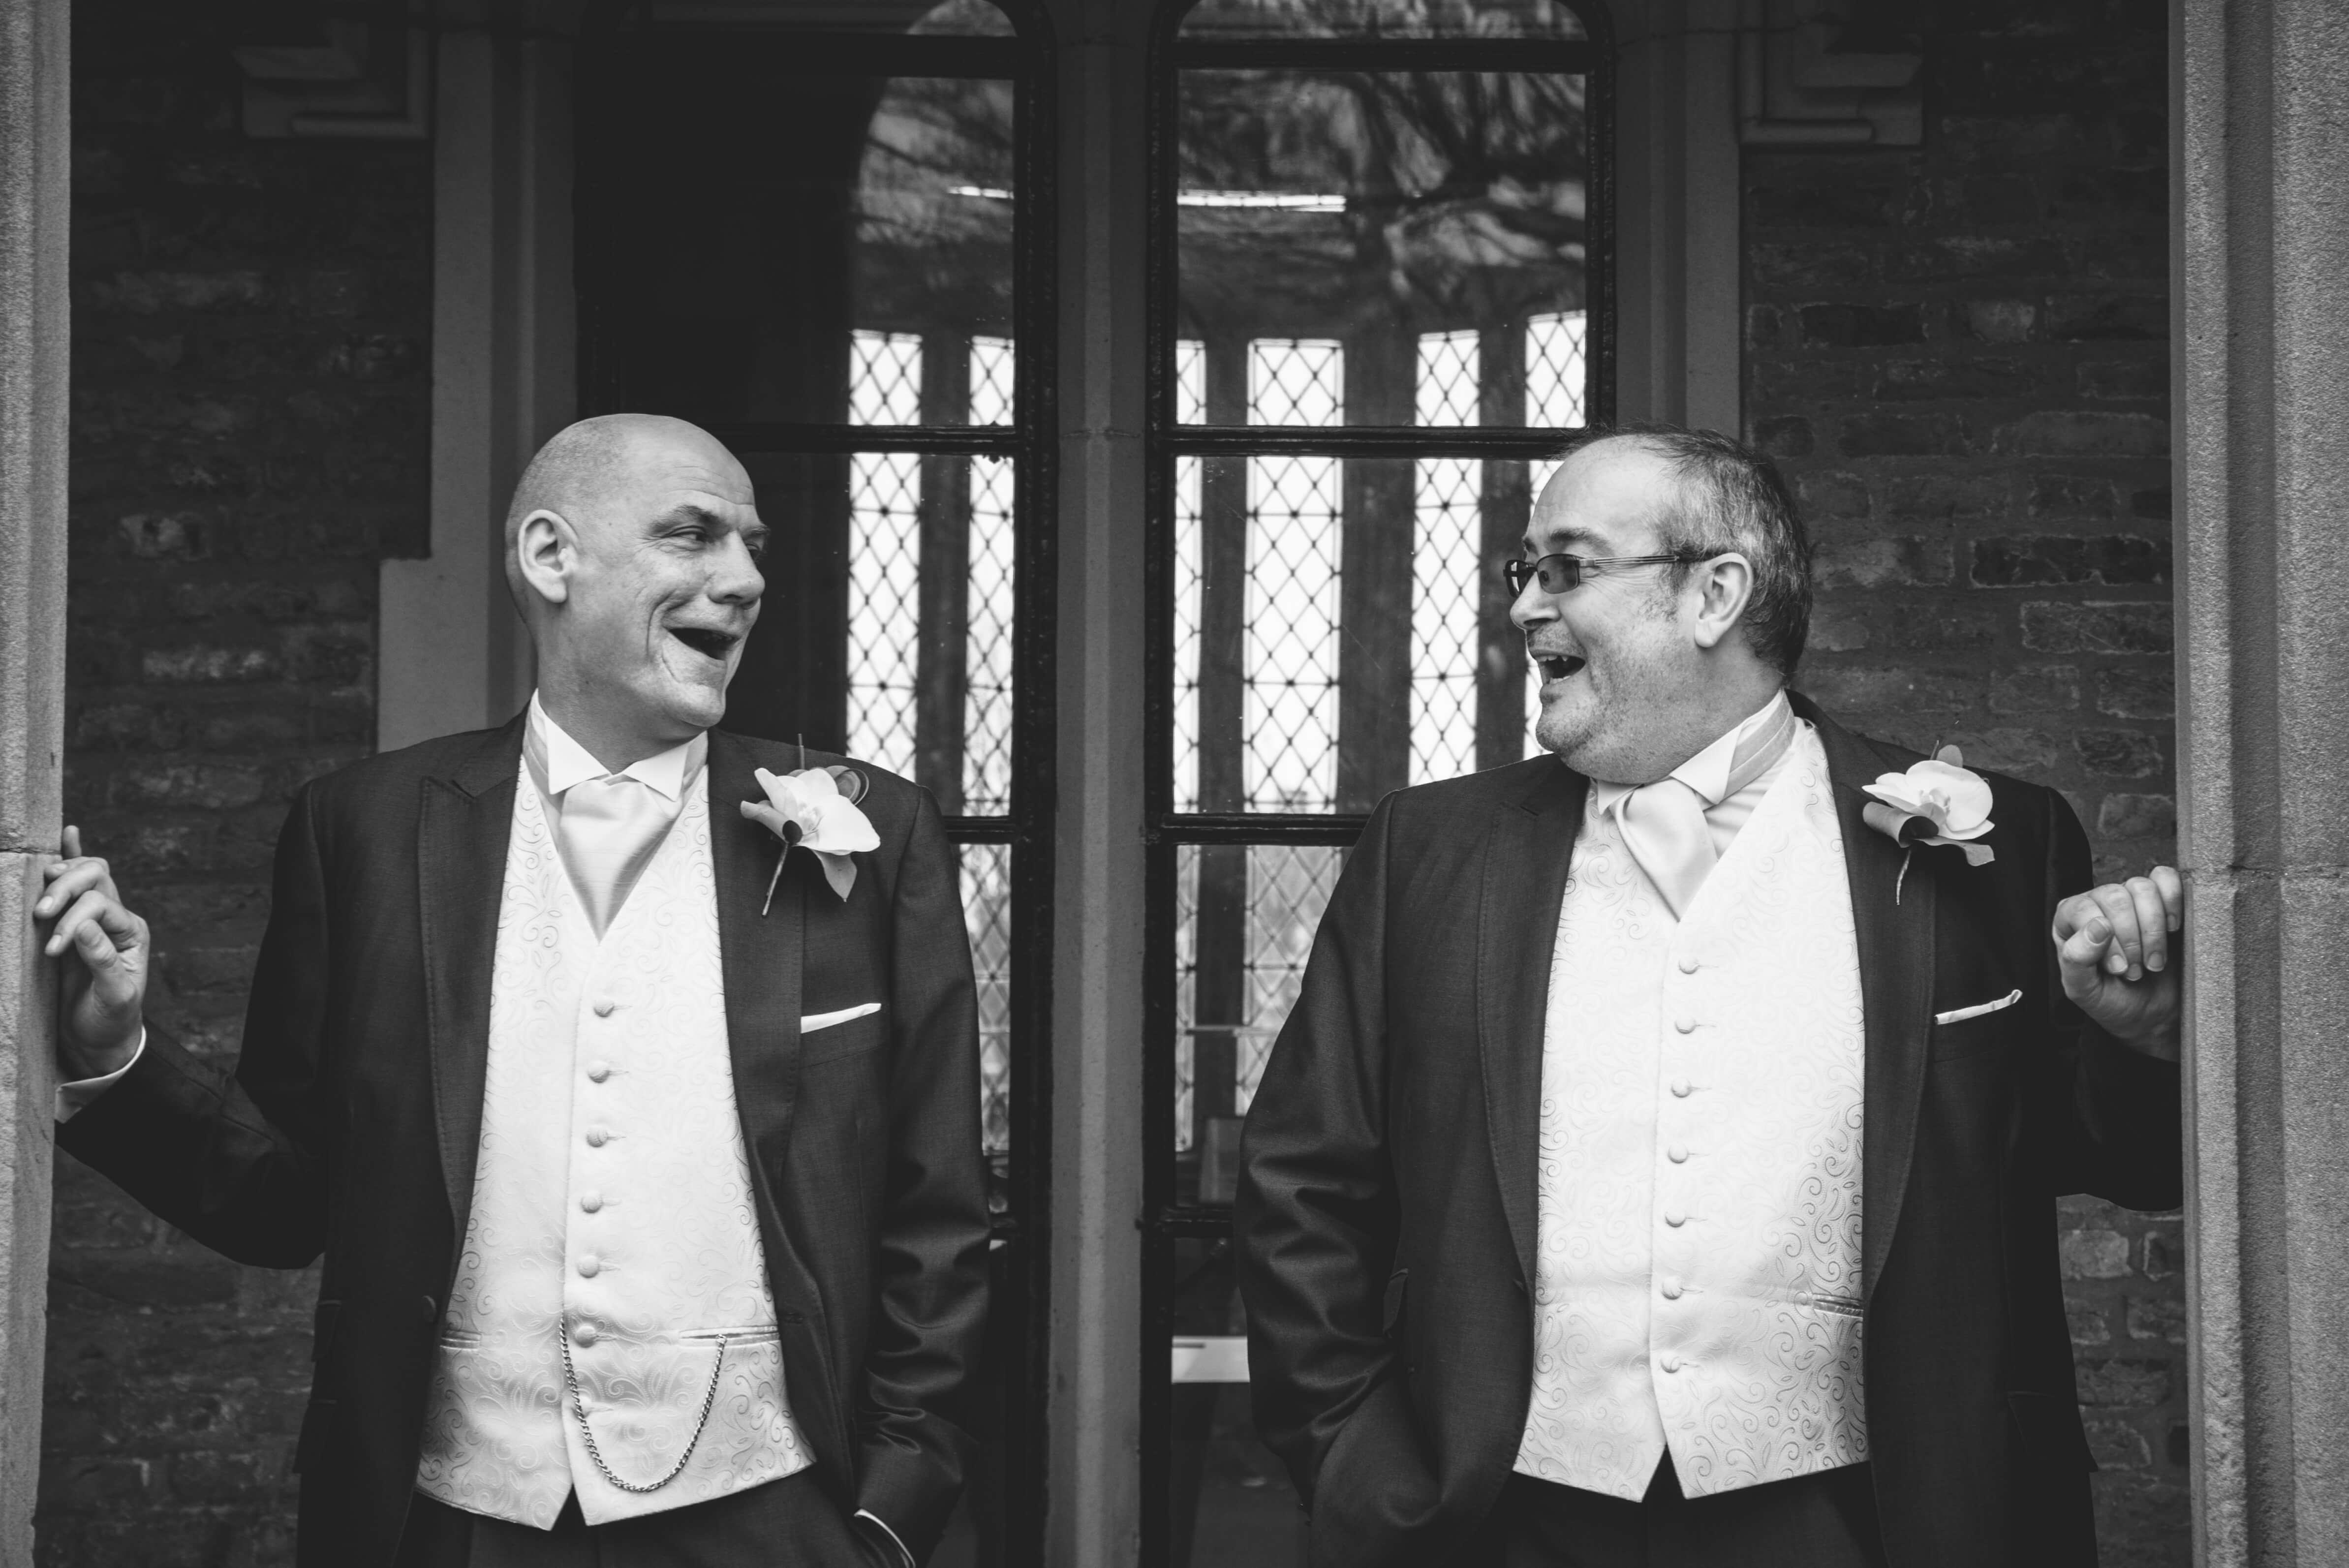 Ayscoughfee Hall Wedding 03 05 2016 1